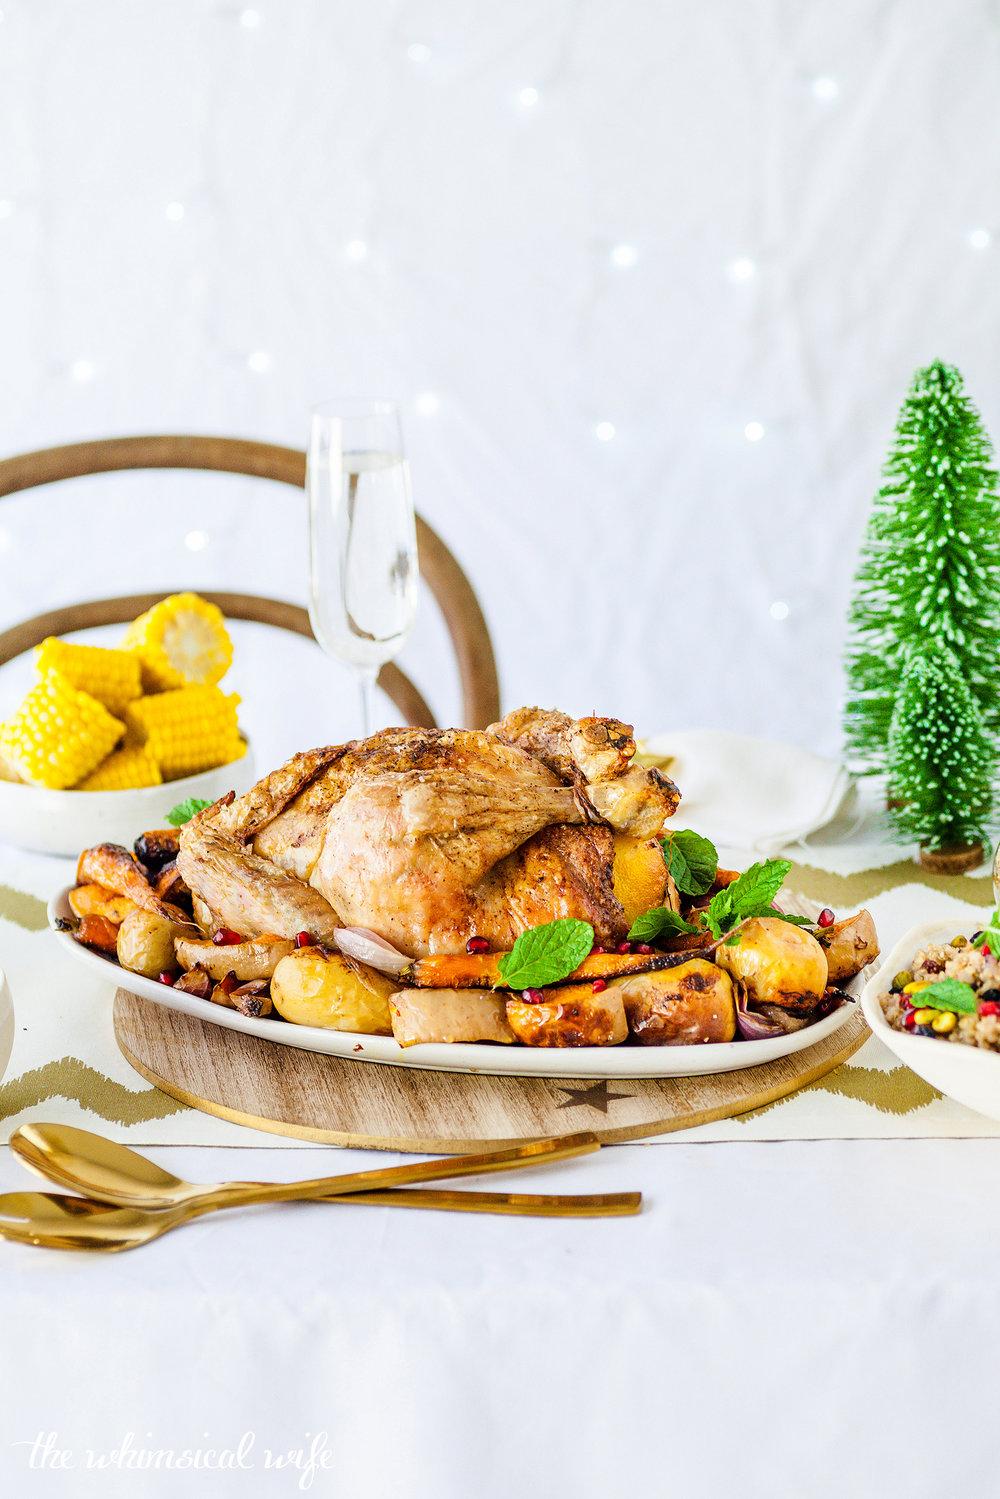 Moroccan Roast Chicken With Quinoa, Pistachio & Currant Stuffing {GF, DF}